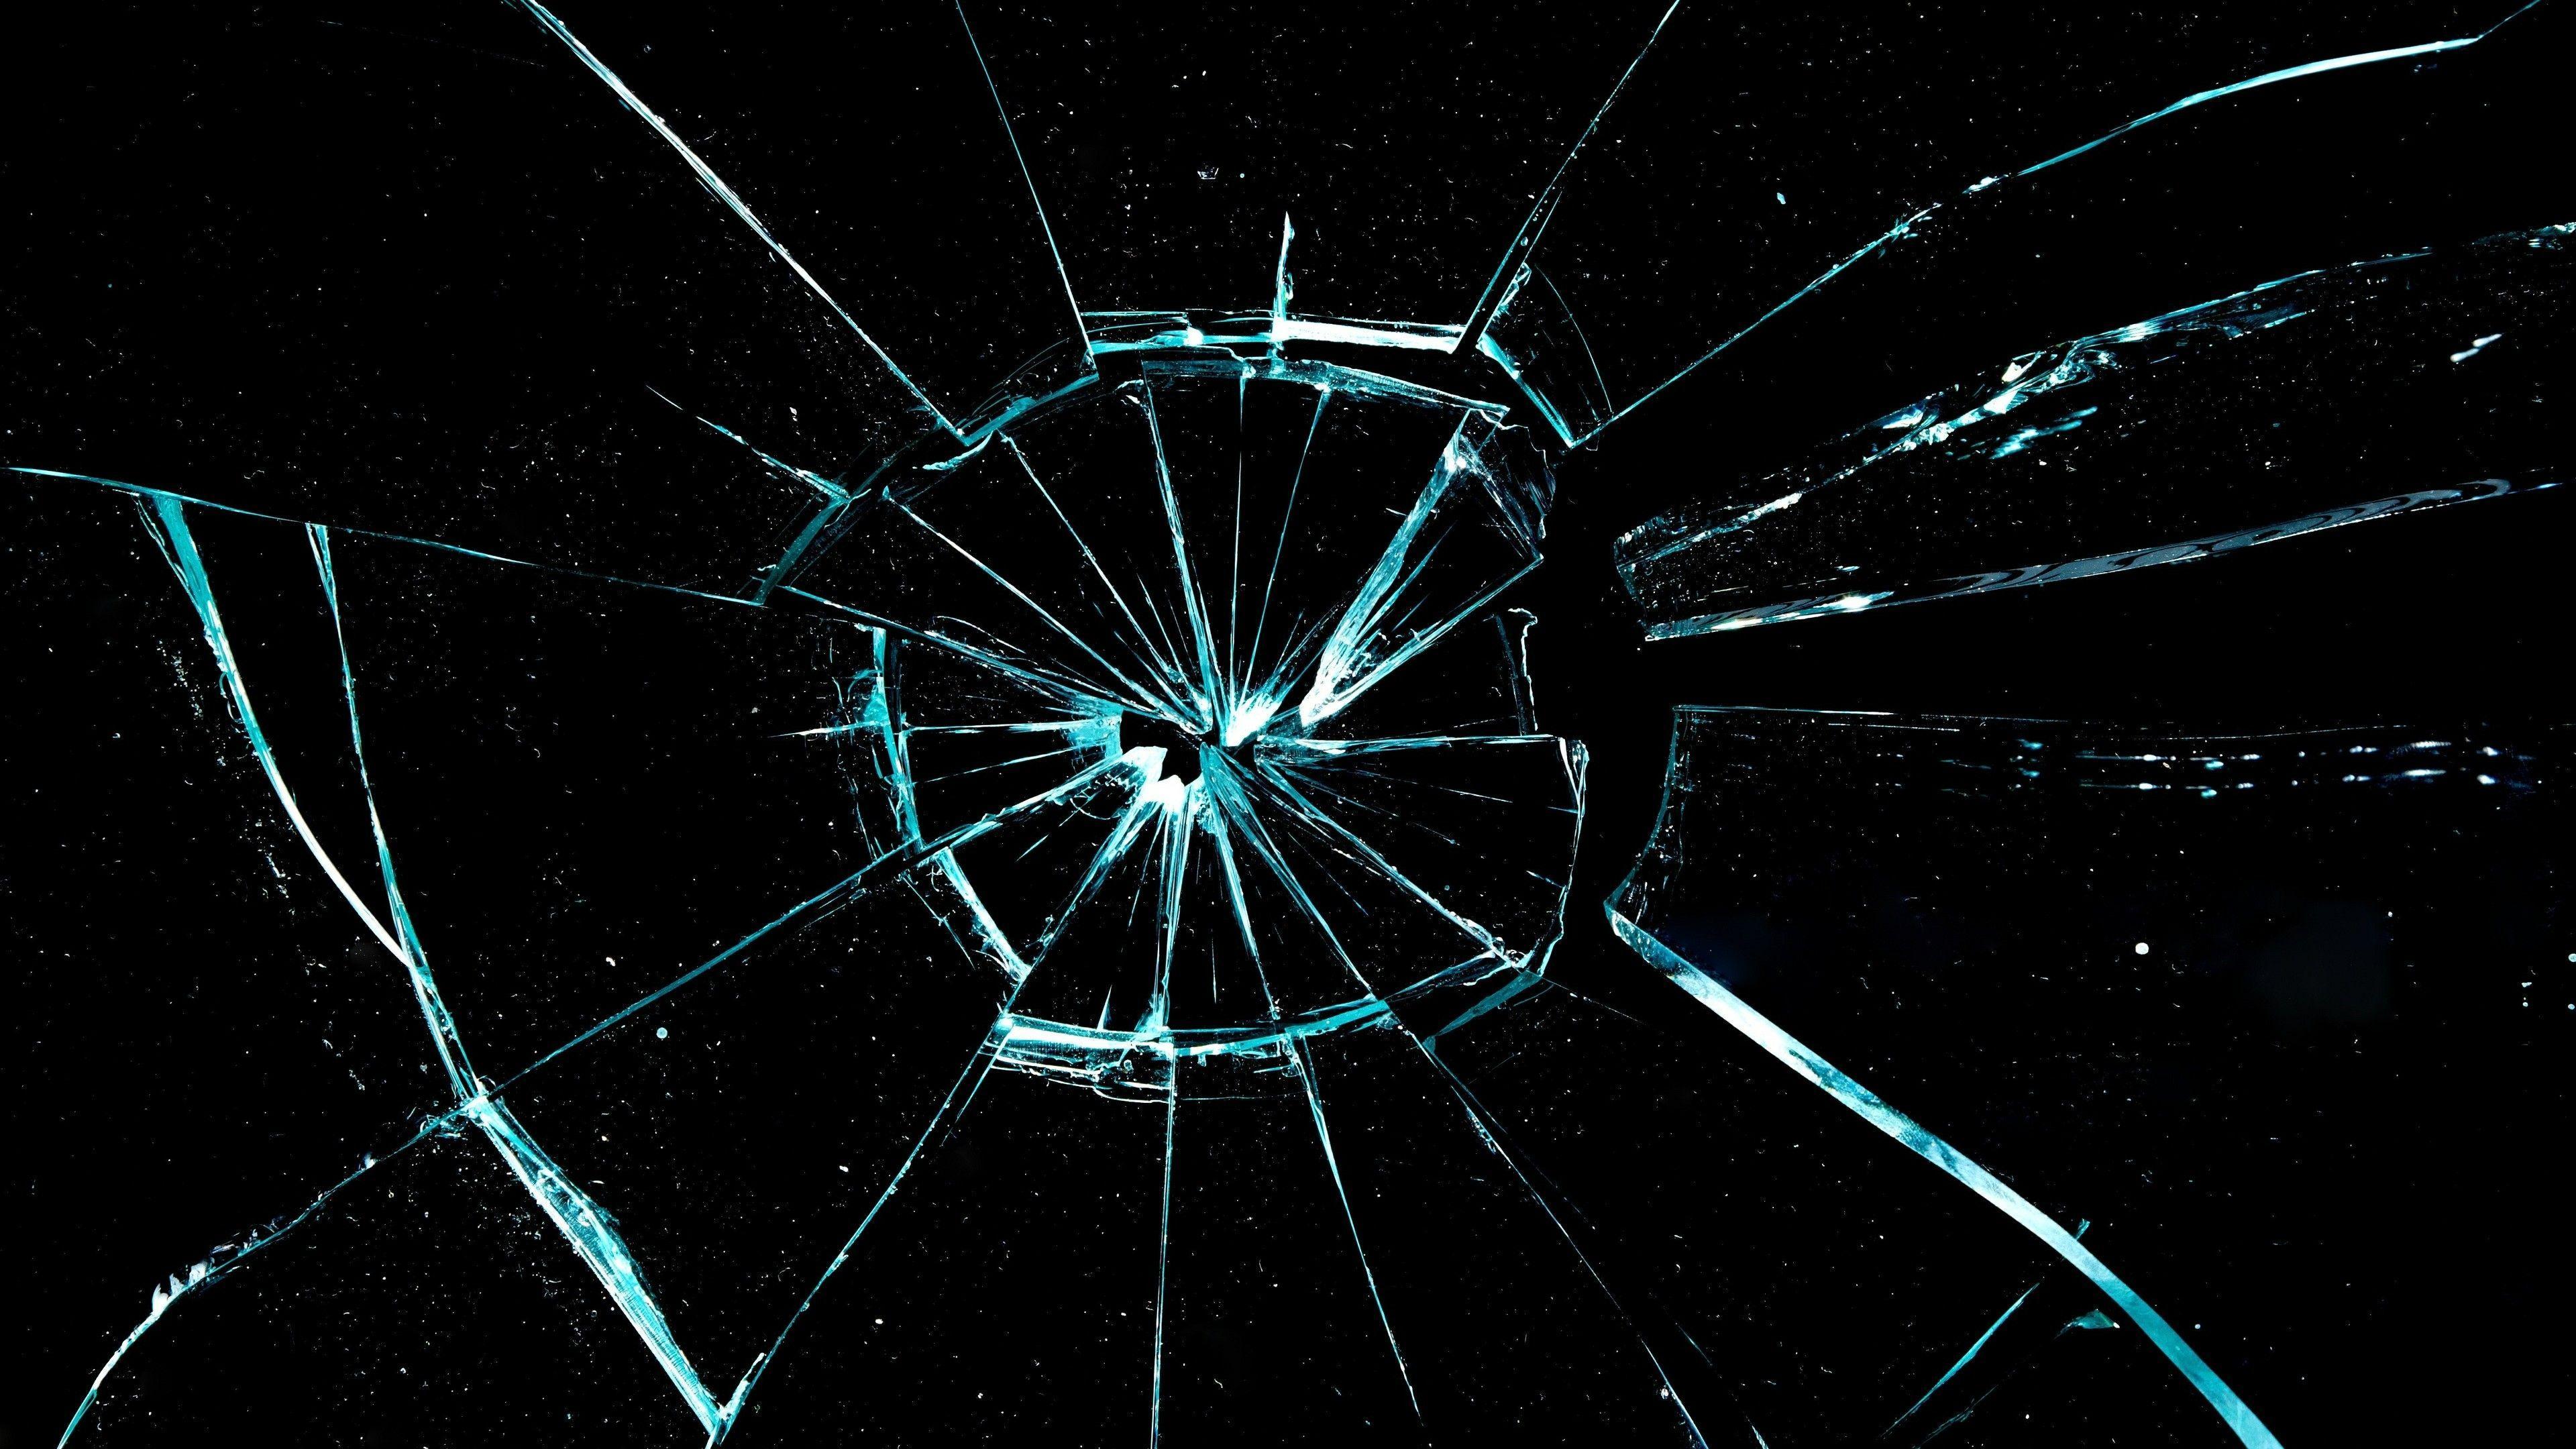 HD Broken Glass Wallpapers - Wallpaper Cave